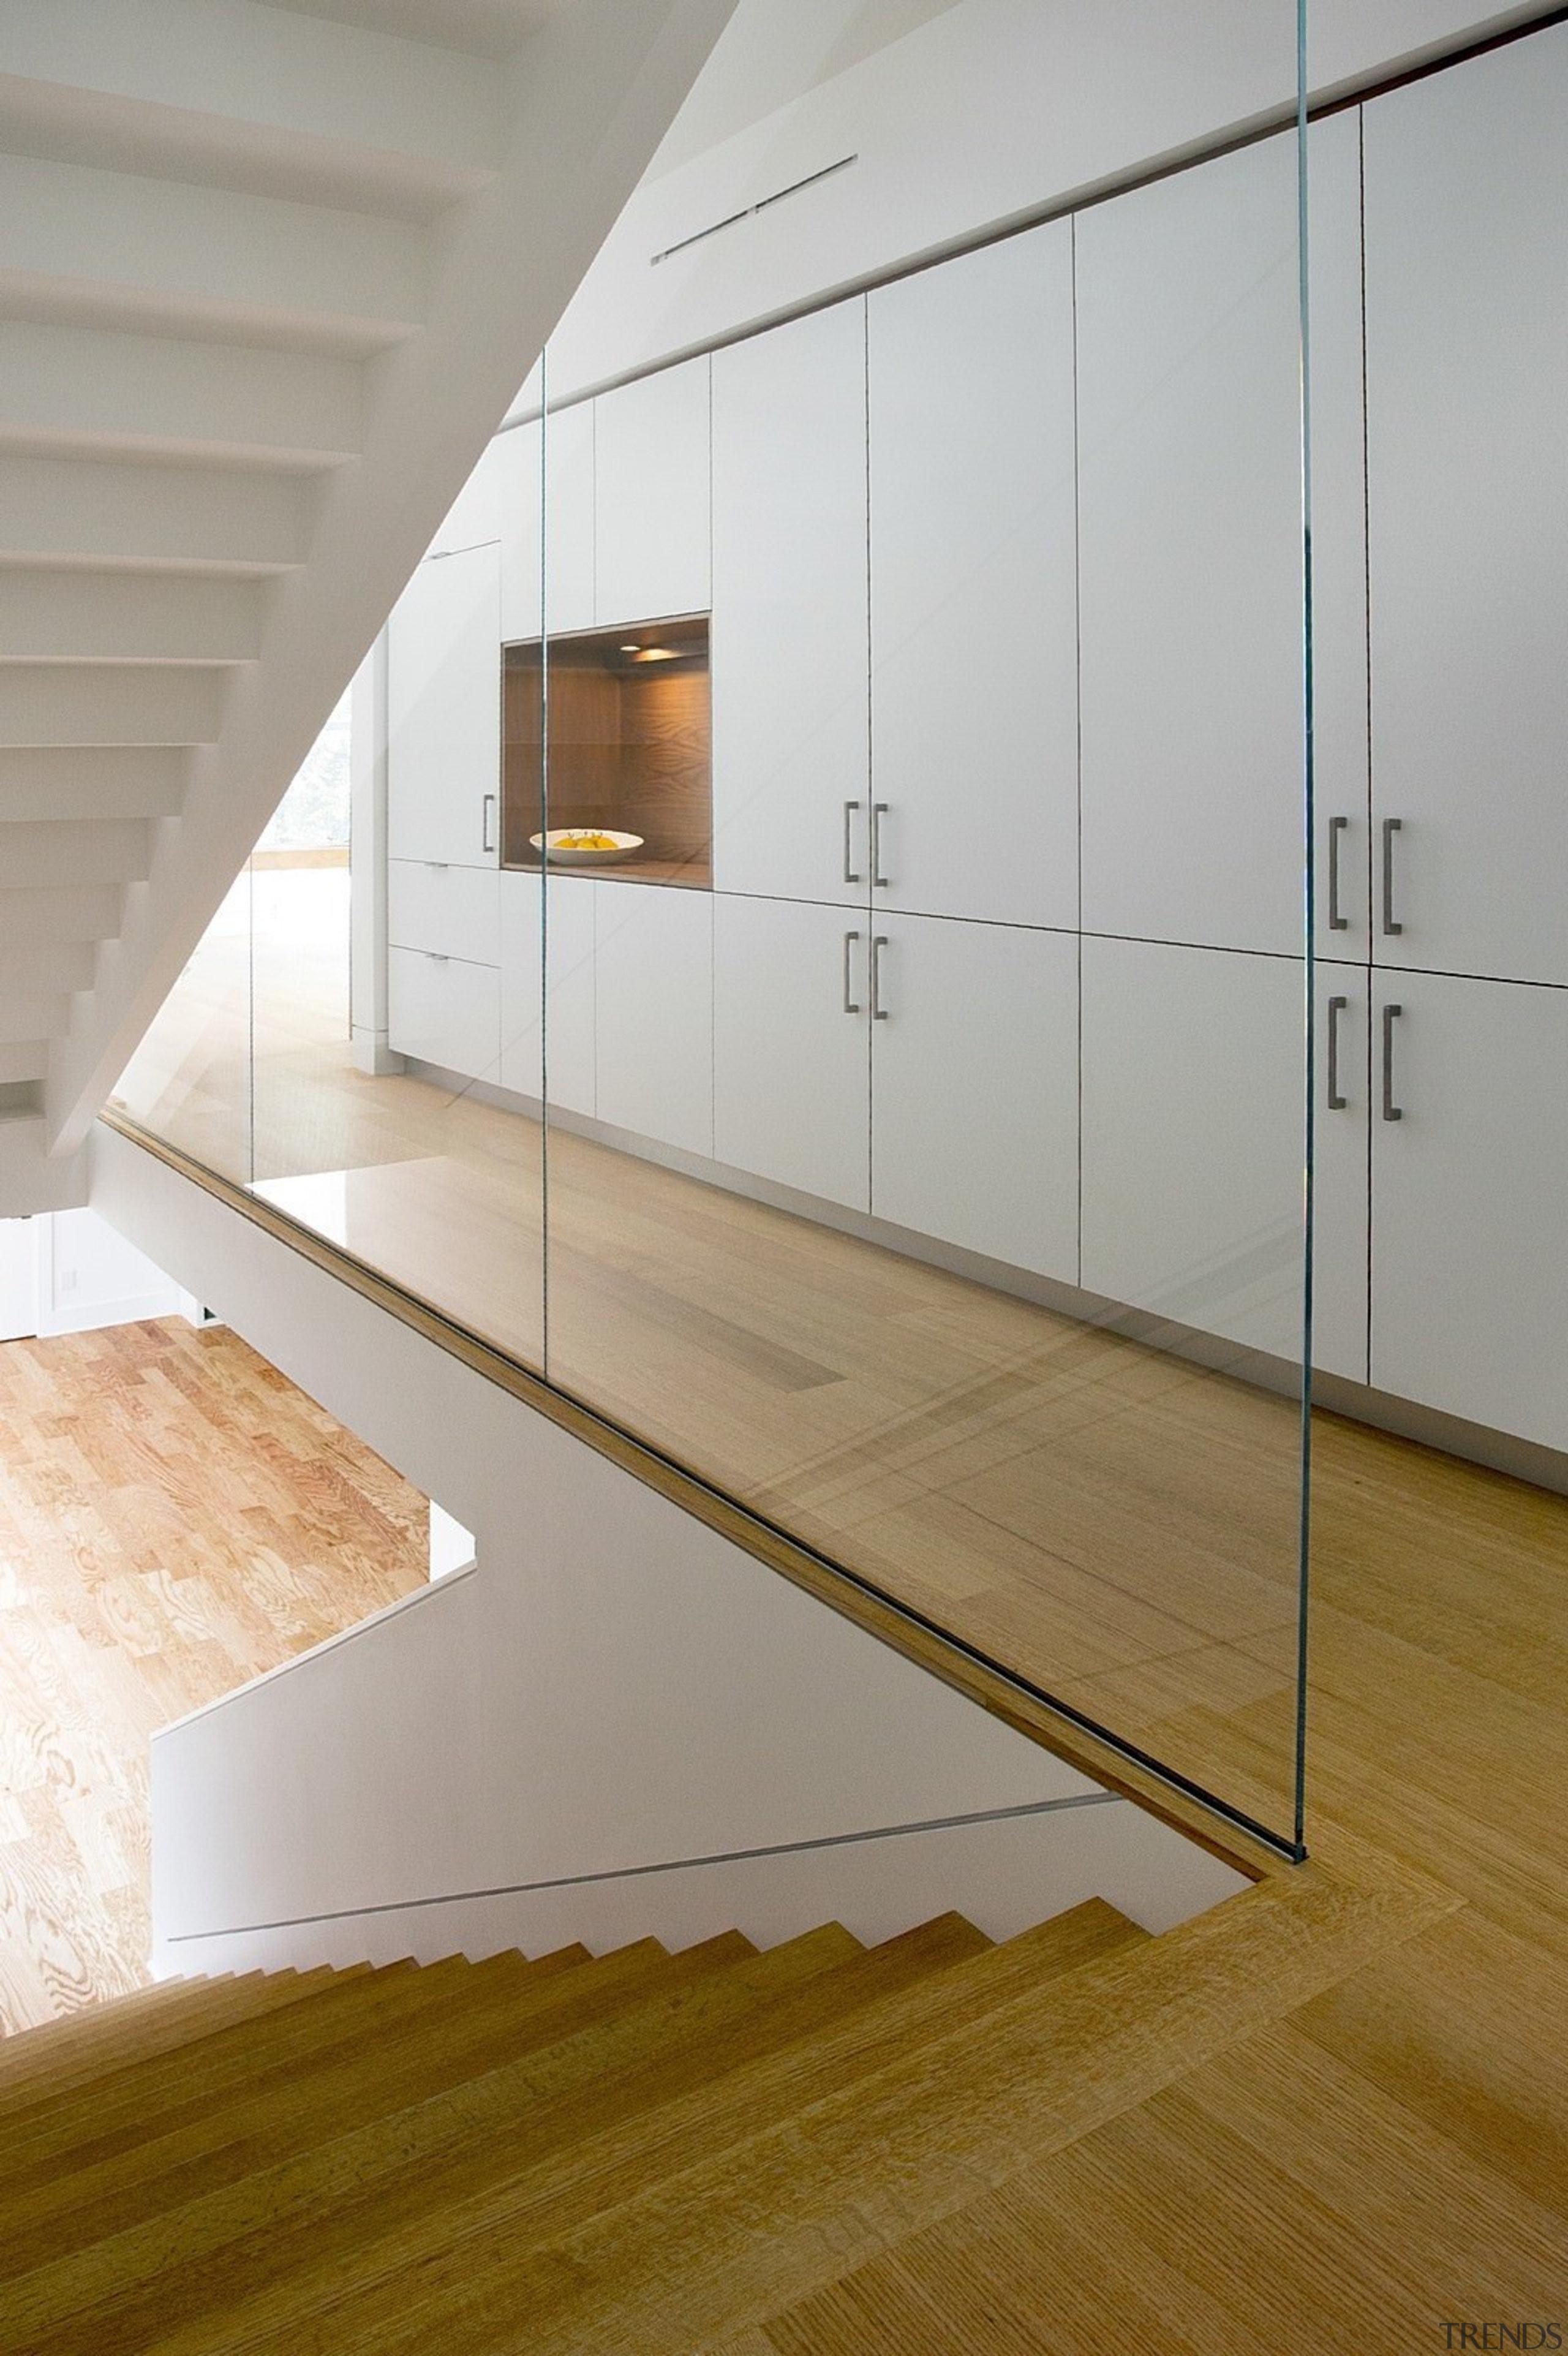 Architect: ZeroEnergy DesignPhotography by Eric Roth architecture, daylighting, floor, flooring, glass, hardwood, interior design, laminate flooring, product design, wood, wood flooring, gray, brown